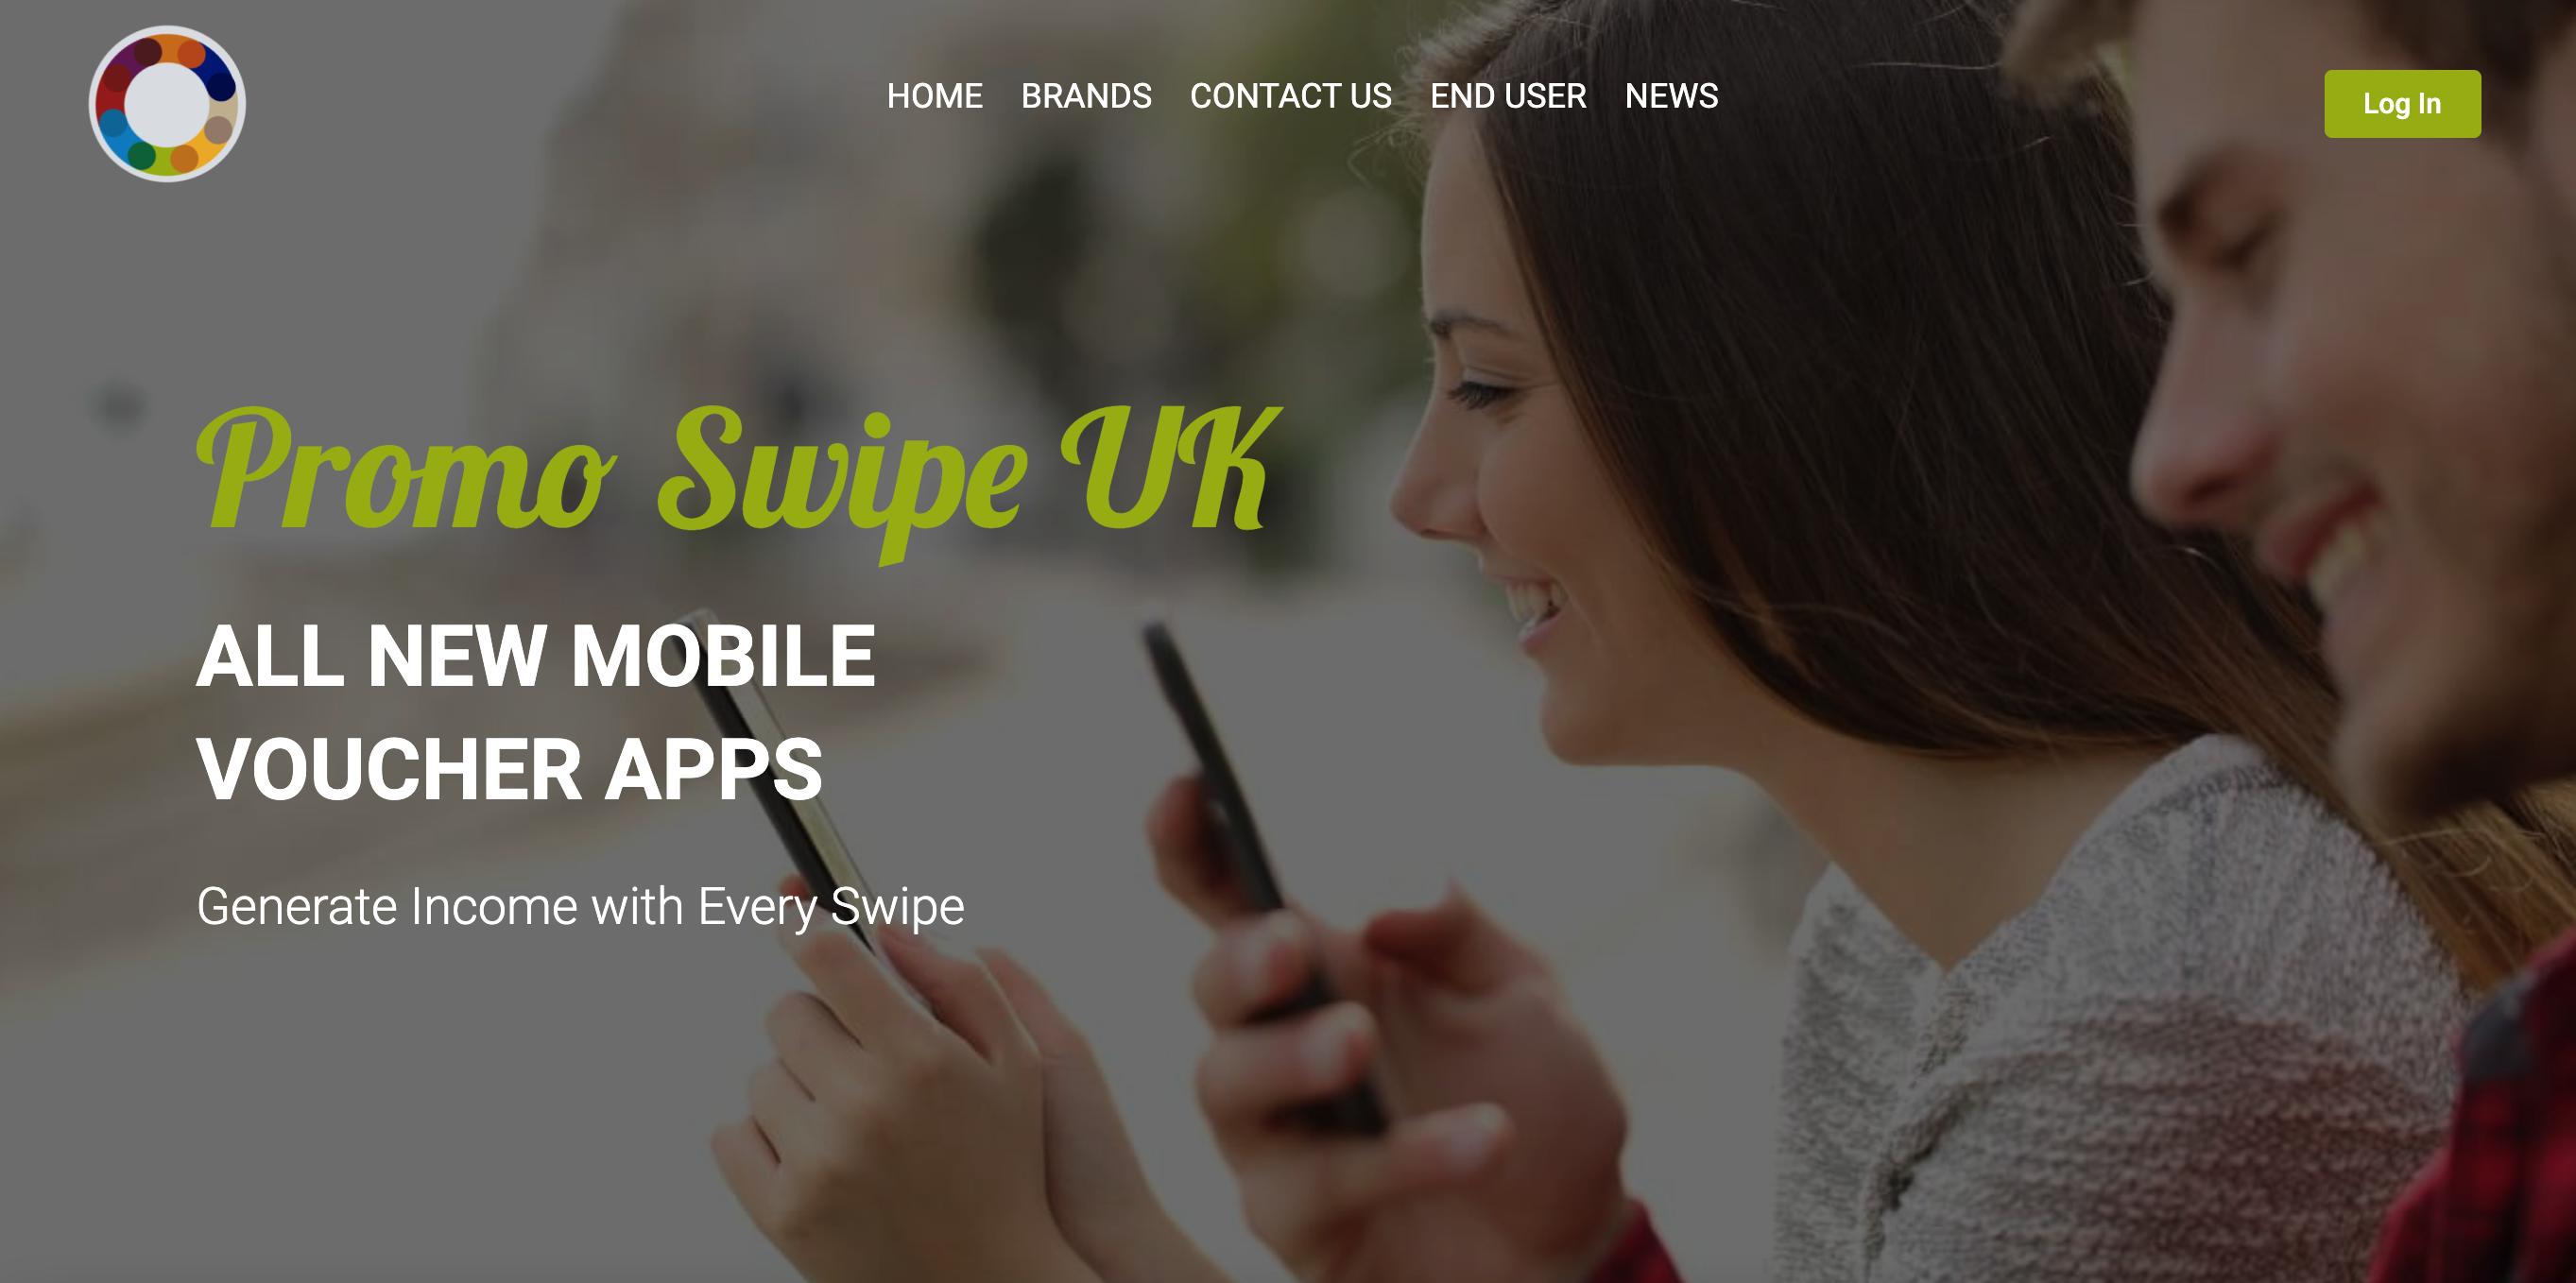 Promo Swipe UK